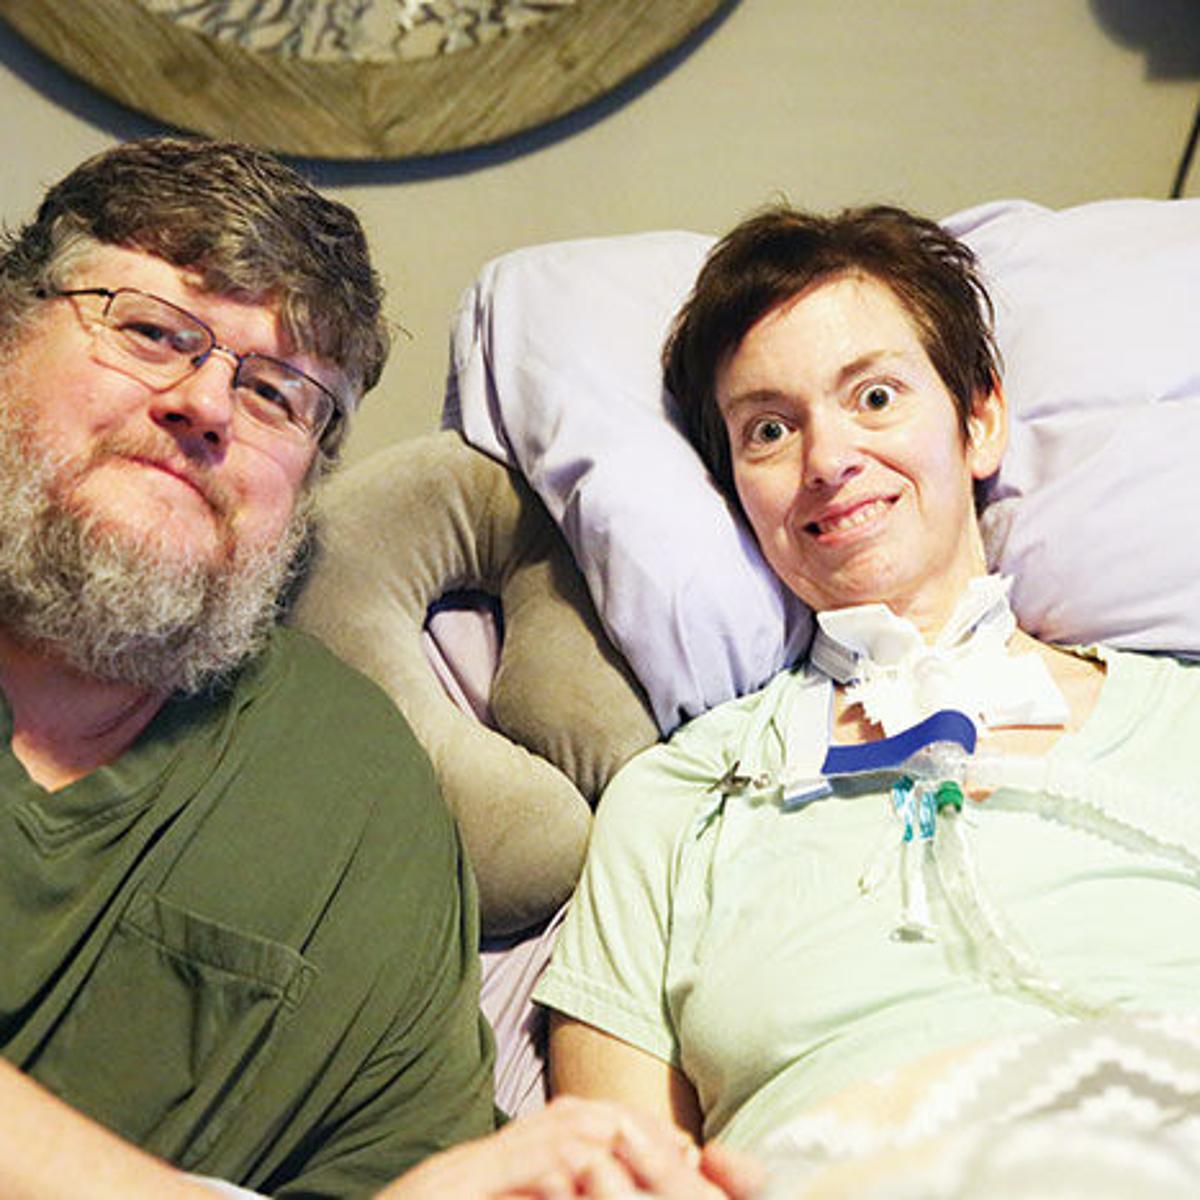 ALS patient overcomes communication challenges | Latest Headlines